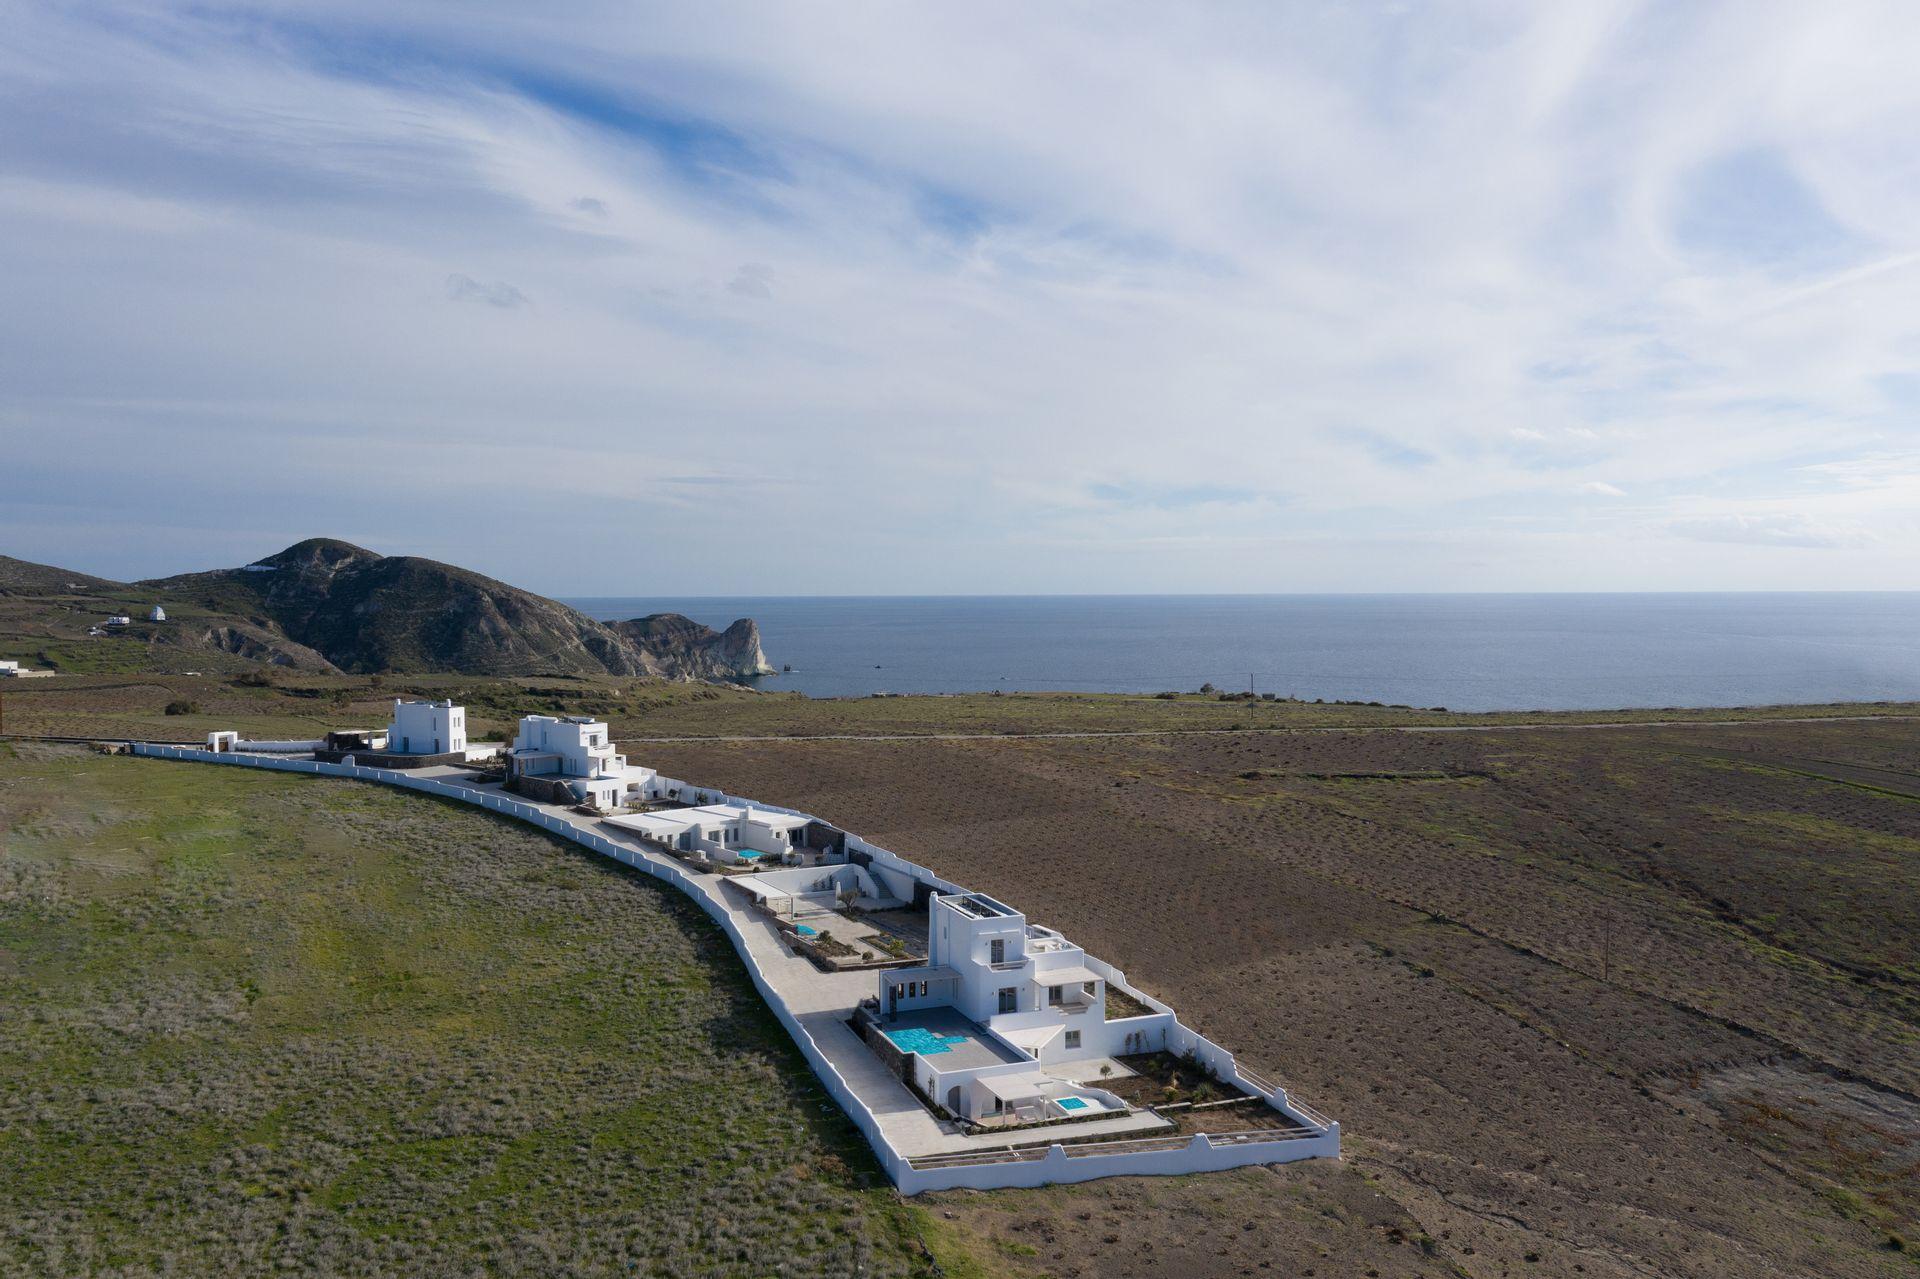 La Ponta Villas - Σαντορίνη ✦ 2 Ημέρες (1 Διανυκτέρευση) ✦ 2 άτομα ✦ Πρωινό ✦ 01/08/2021 έως 30/09/2021 ✦ Υπέροχη Τοποθεσία!